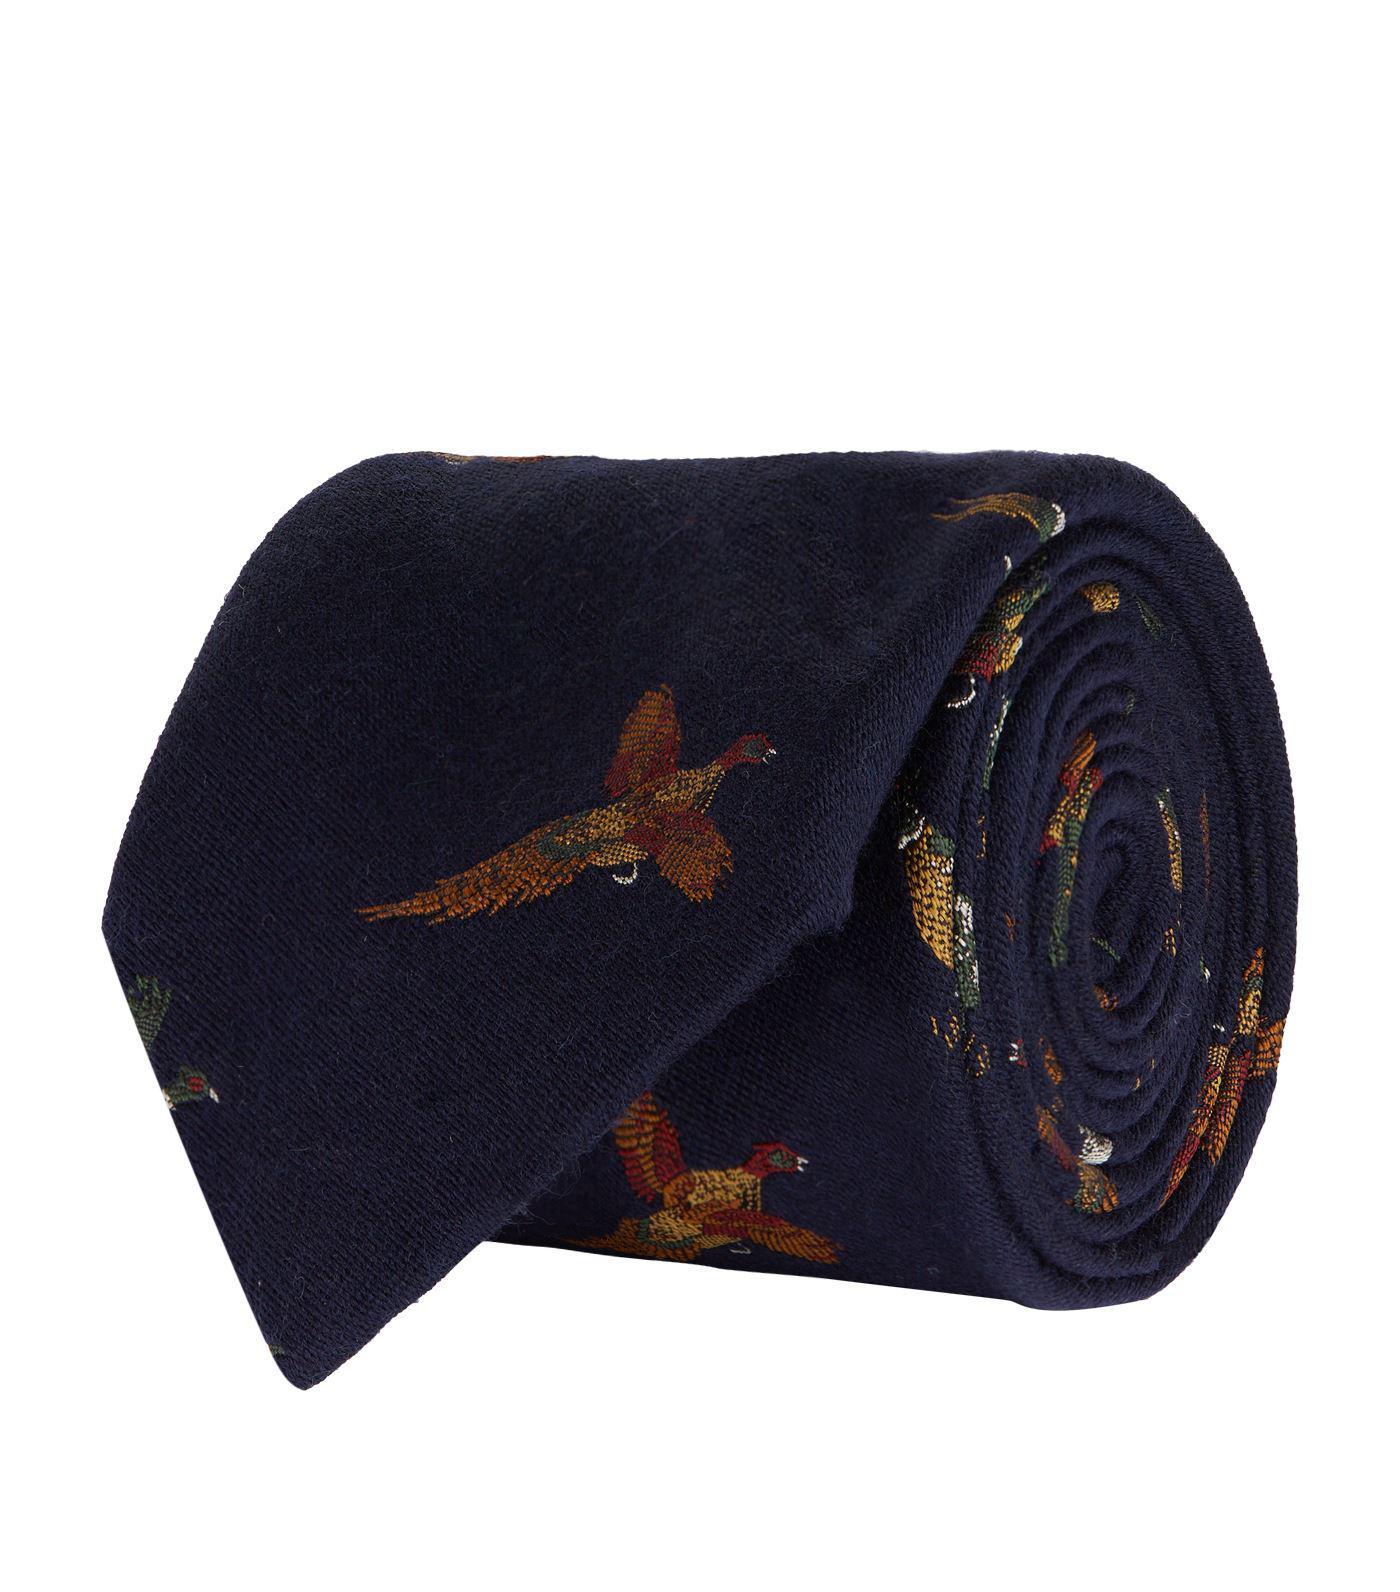 4d30376acb Polo Ralph Lauren Game Bird Tie in Blue for Men - Lyst